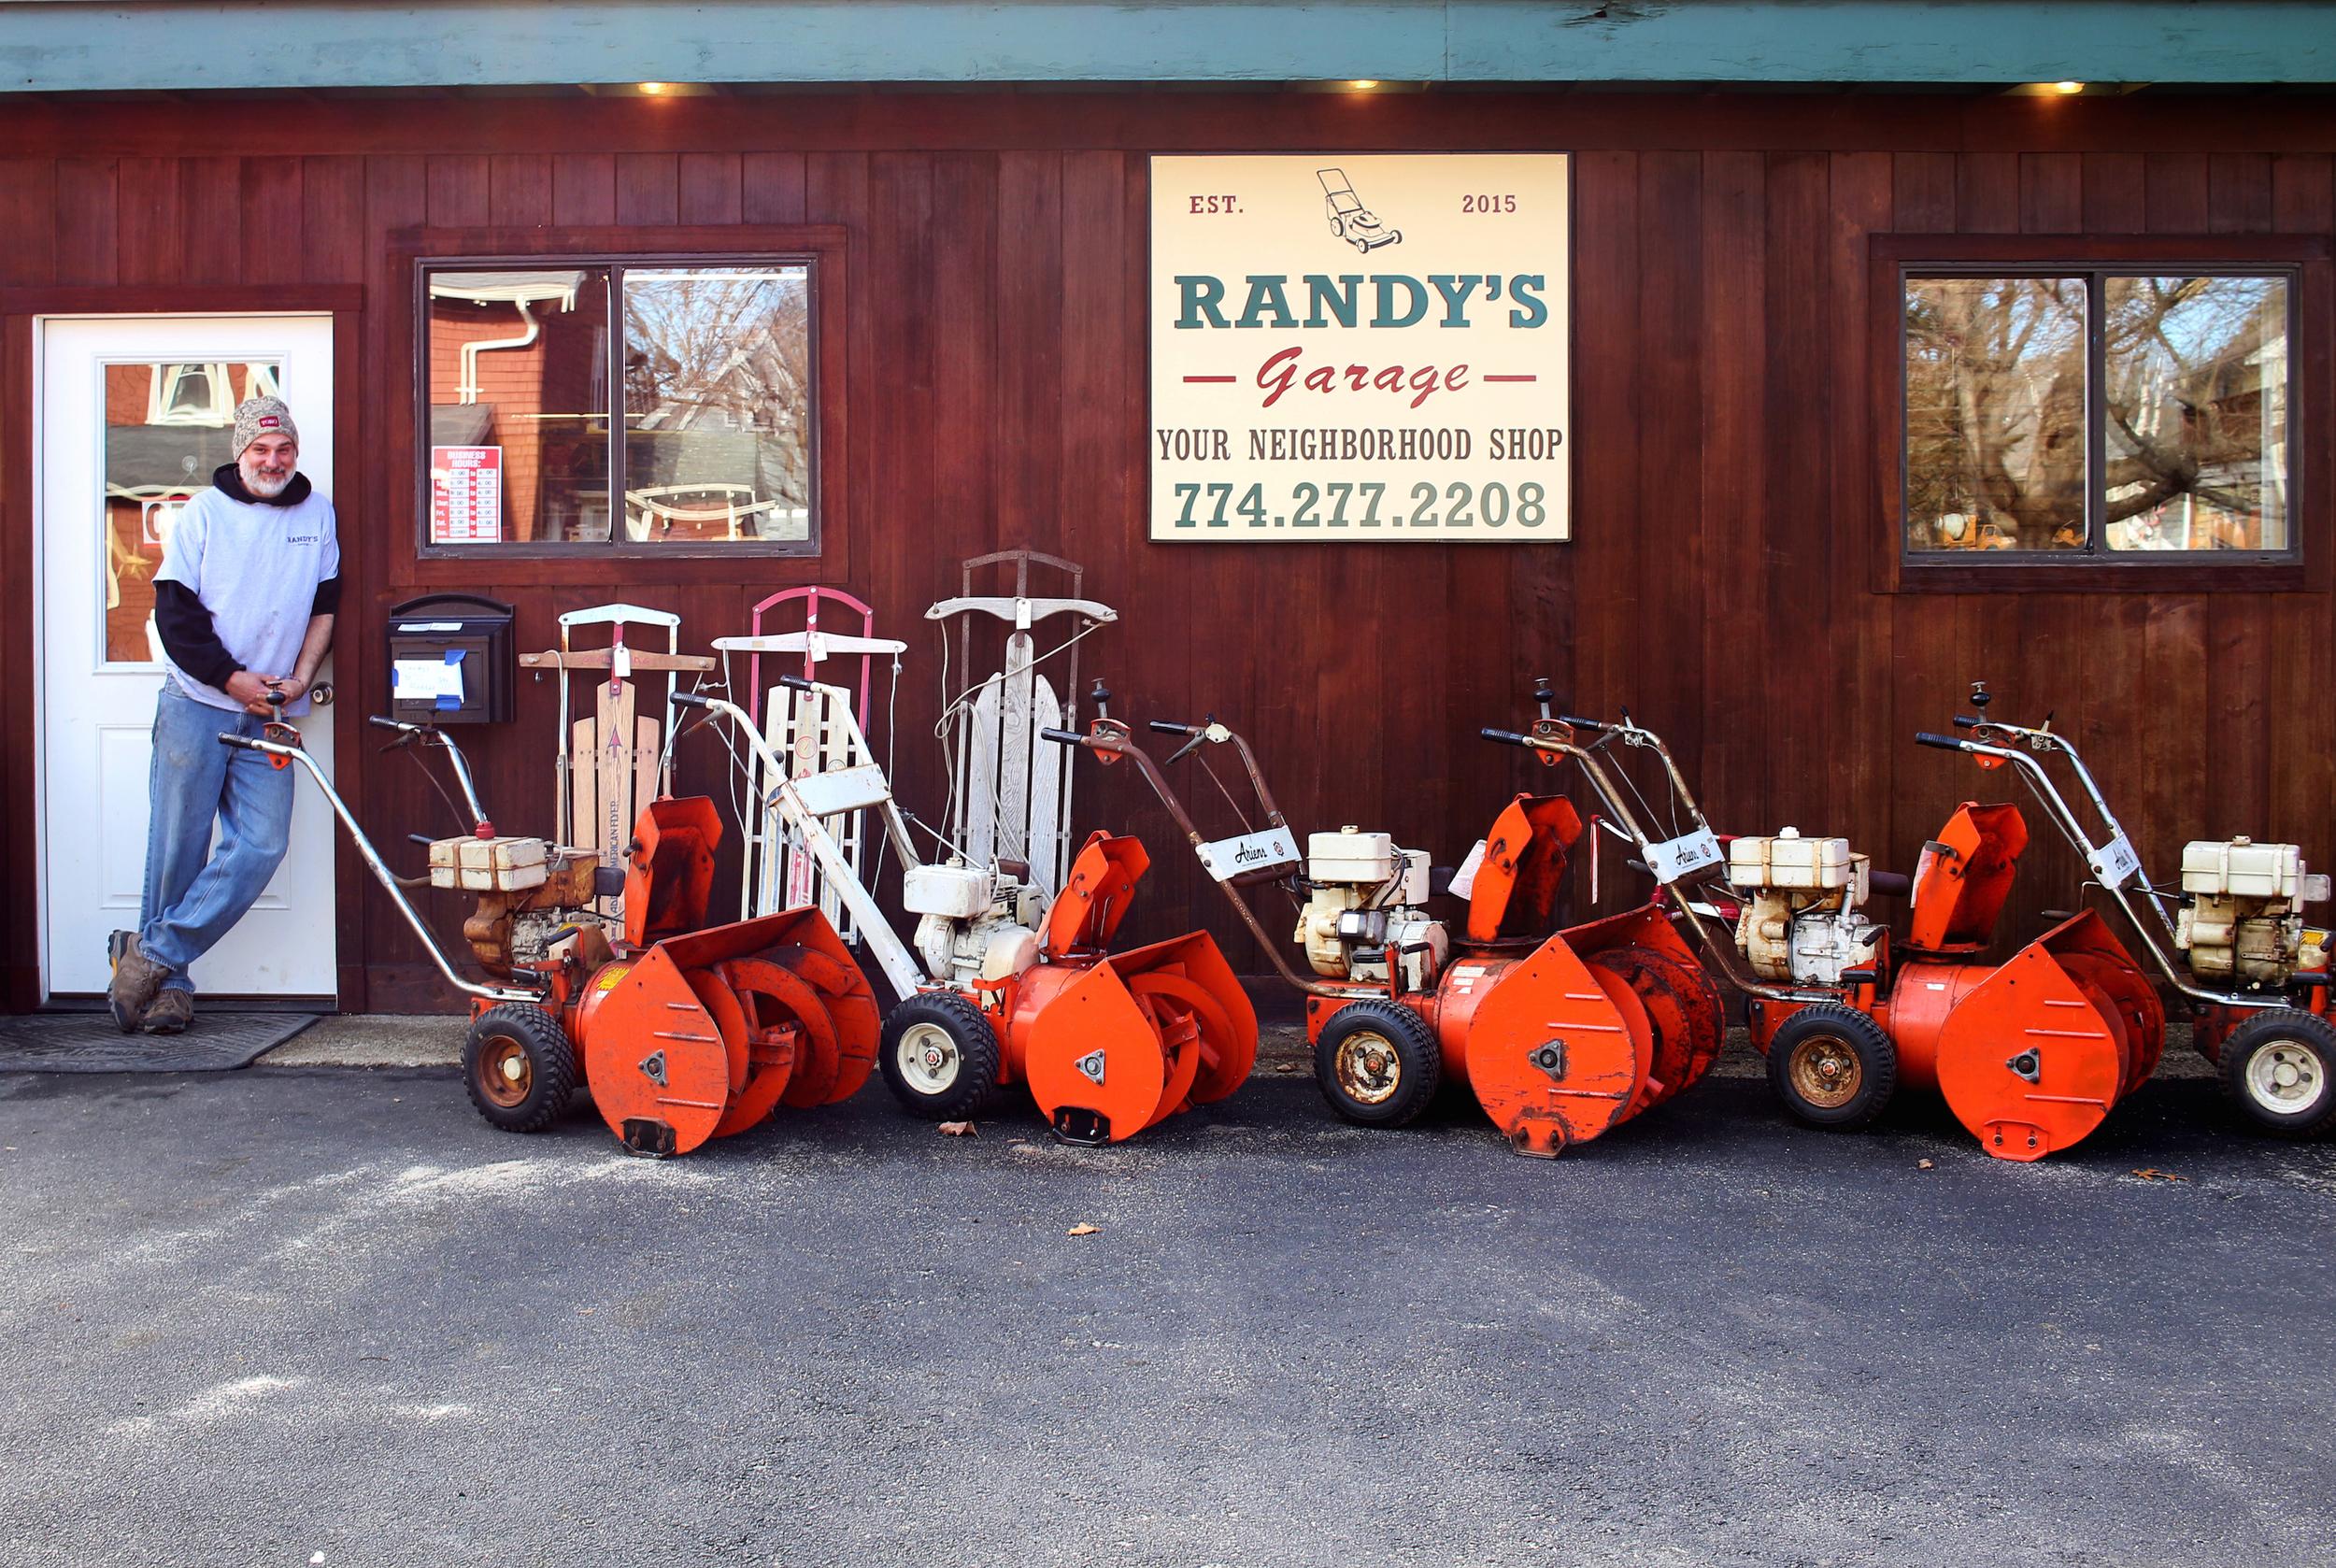 Randy Disinger of Randy's Garage